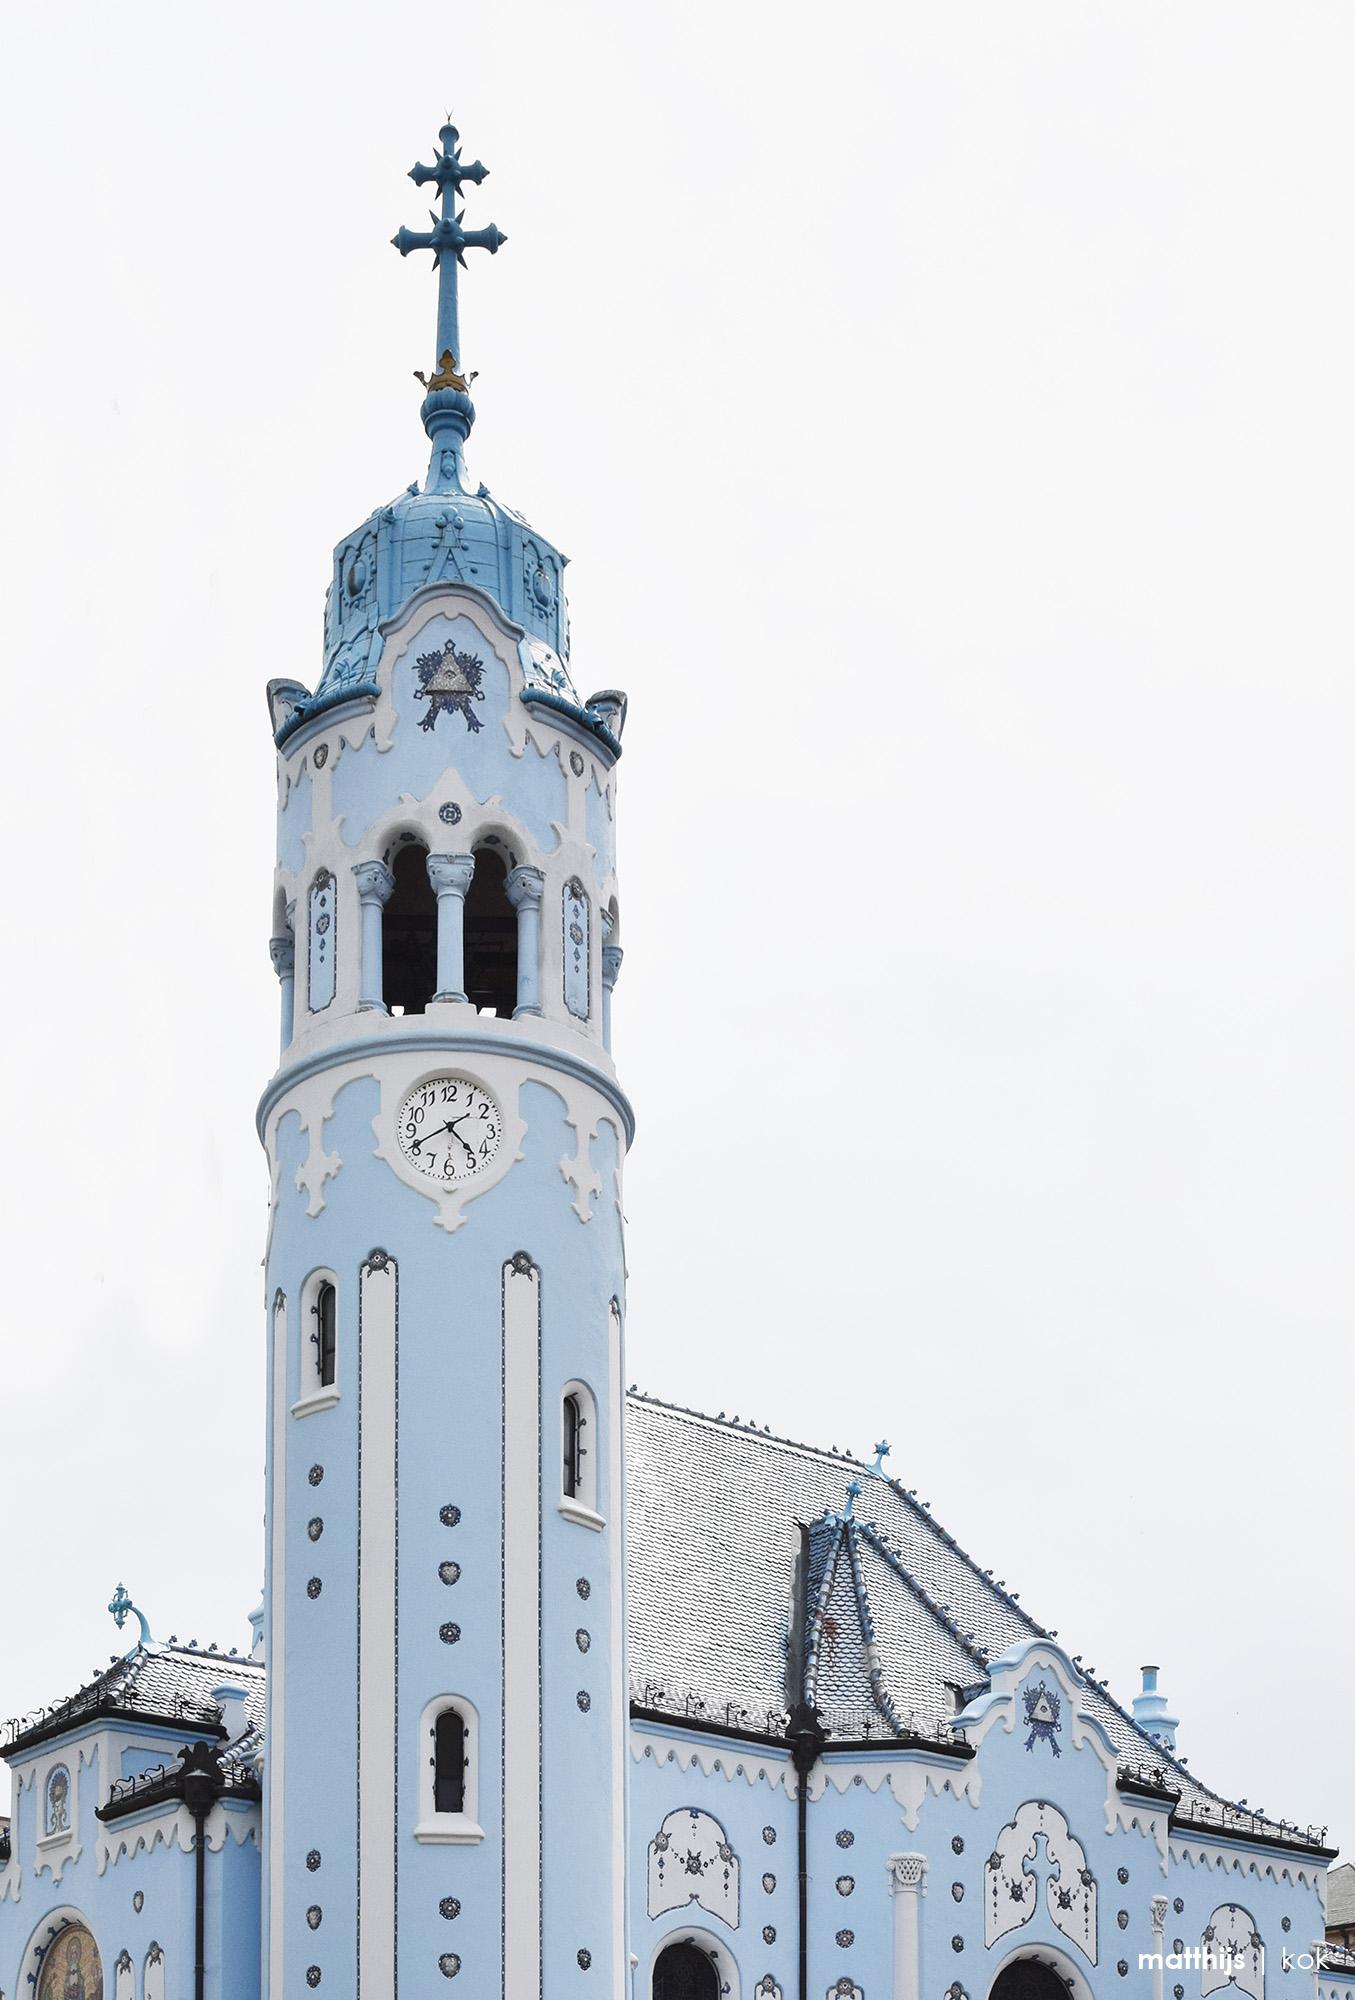 Blue Church, Bratislava, Slovakia | Photo by Matthijs Kok